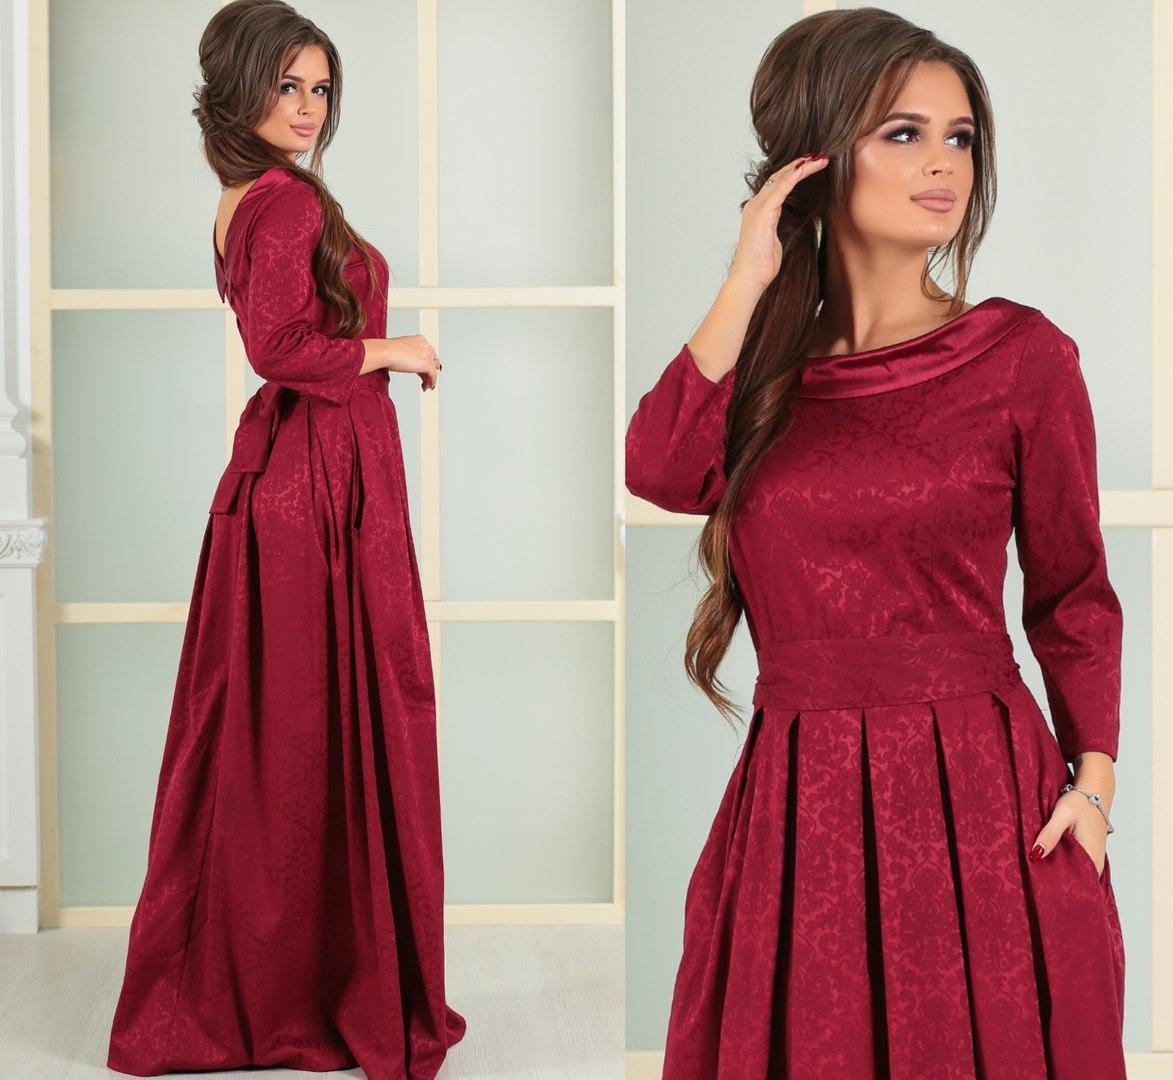 de7d2a0998b Великолепное вечернее платье в пол жаккард + атлас РАЗМЕРЫ 42